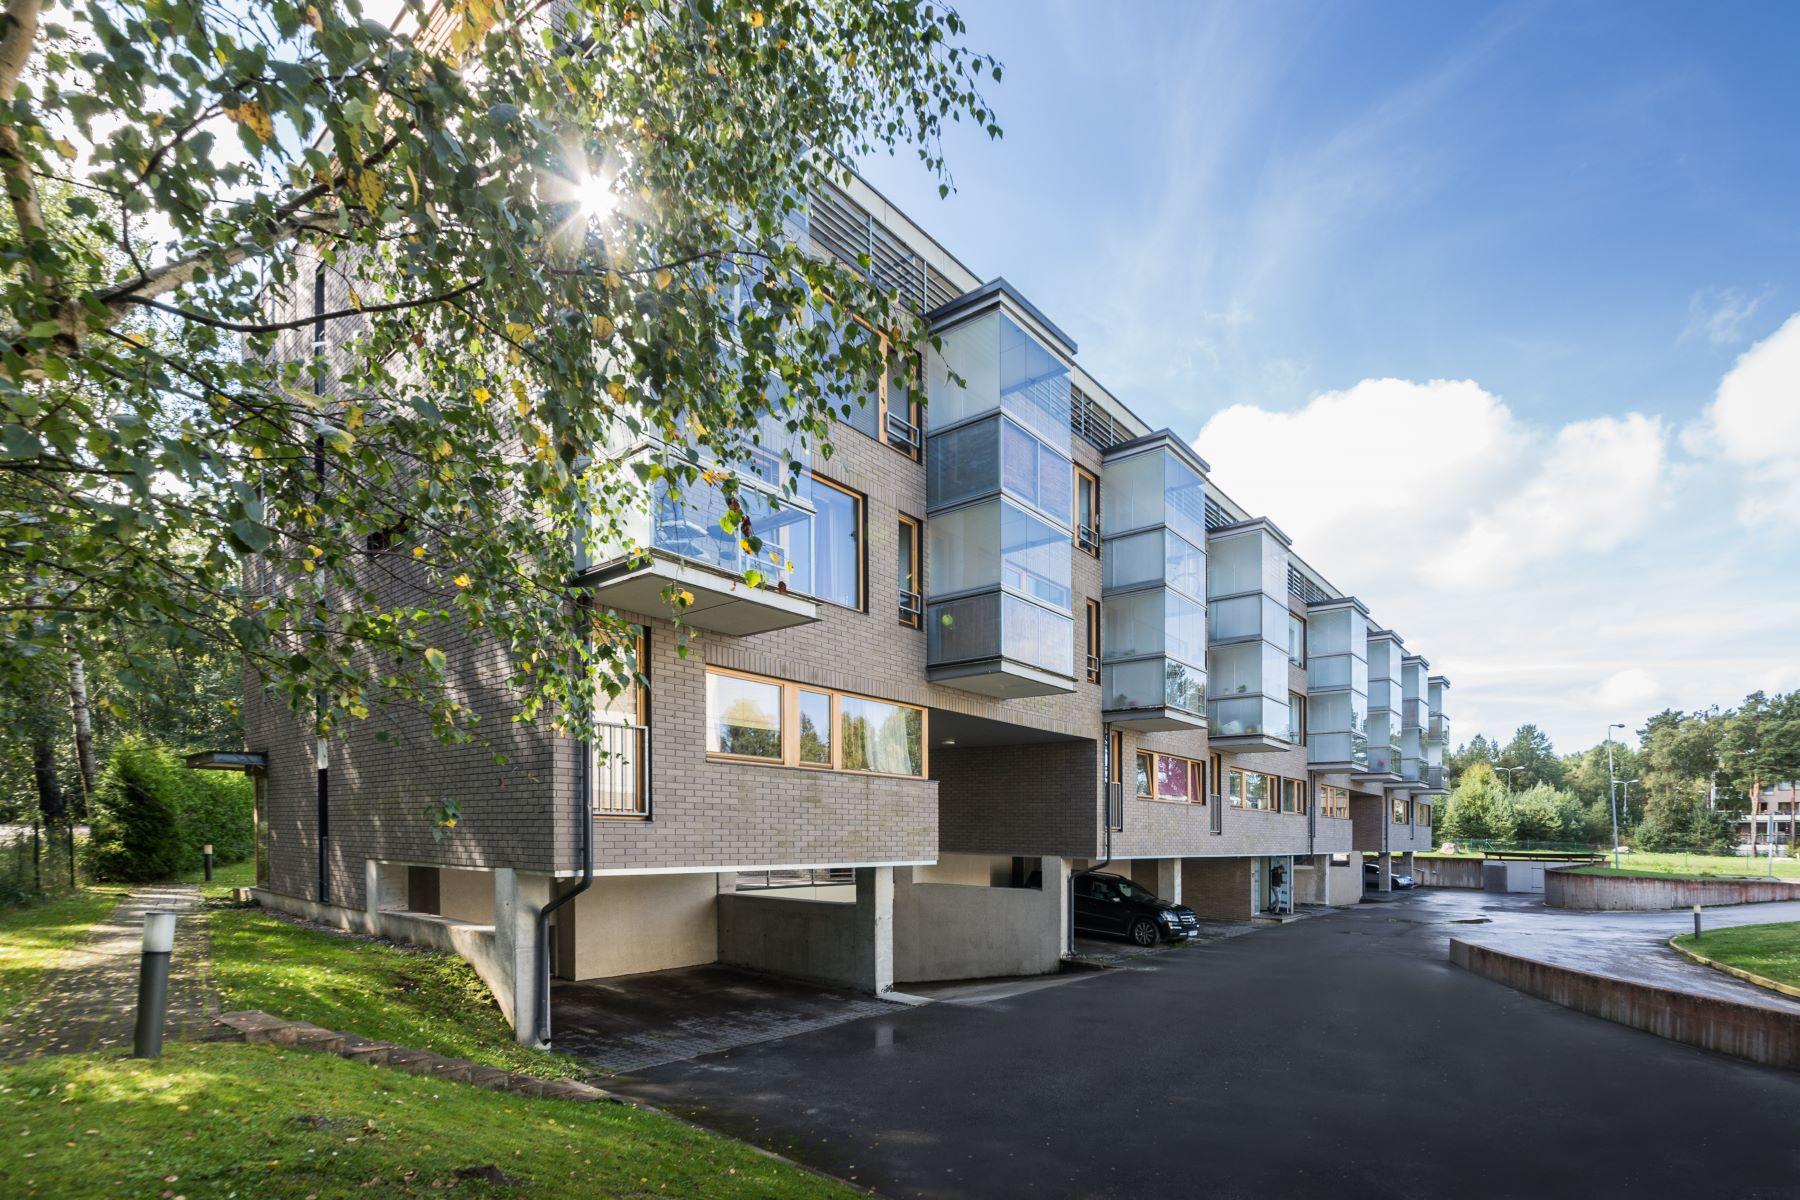 Apartment for Sale at Уютная двухуровневая квартира в прибрежном Мерираху, в Таллинне! Tallinn, Harjumaa, Estonia